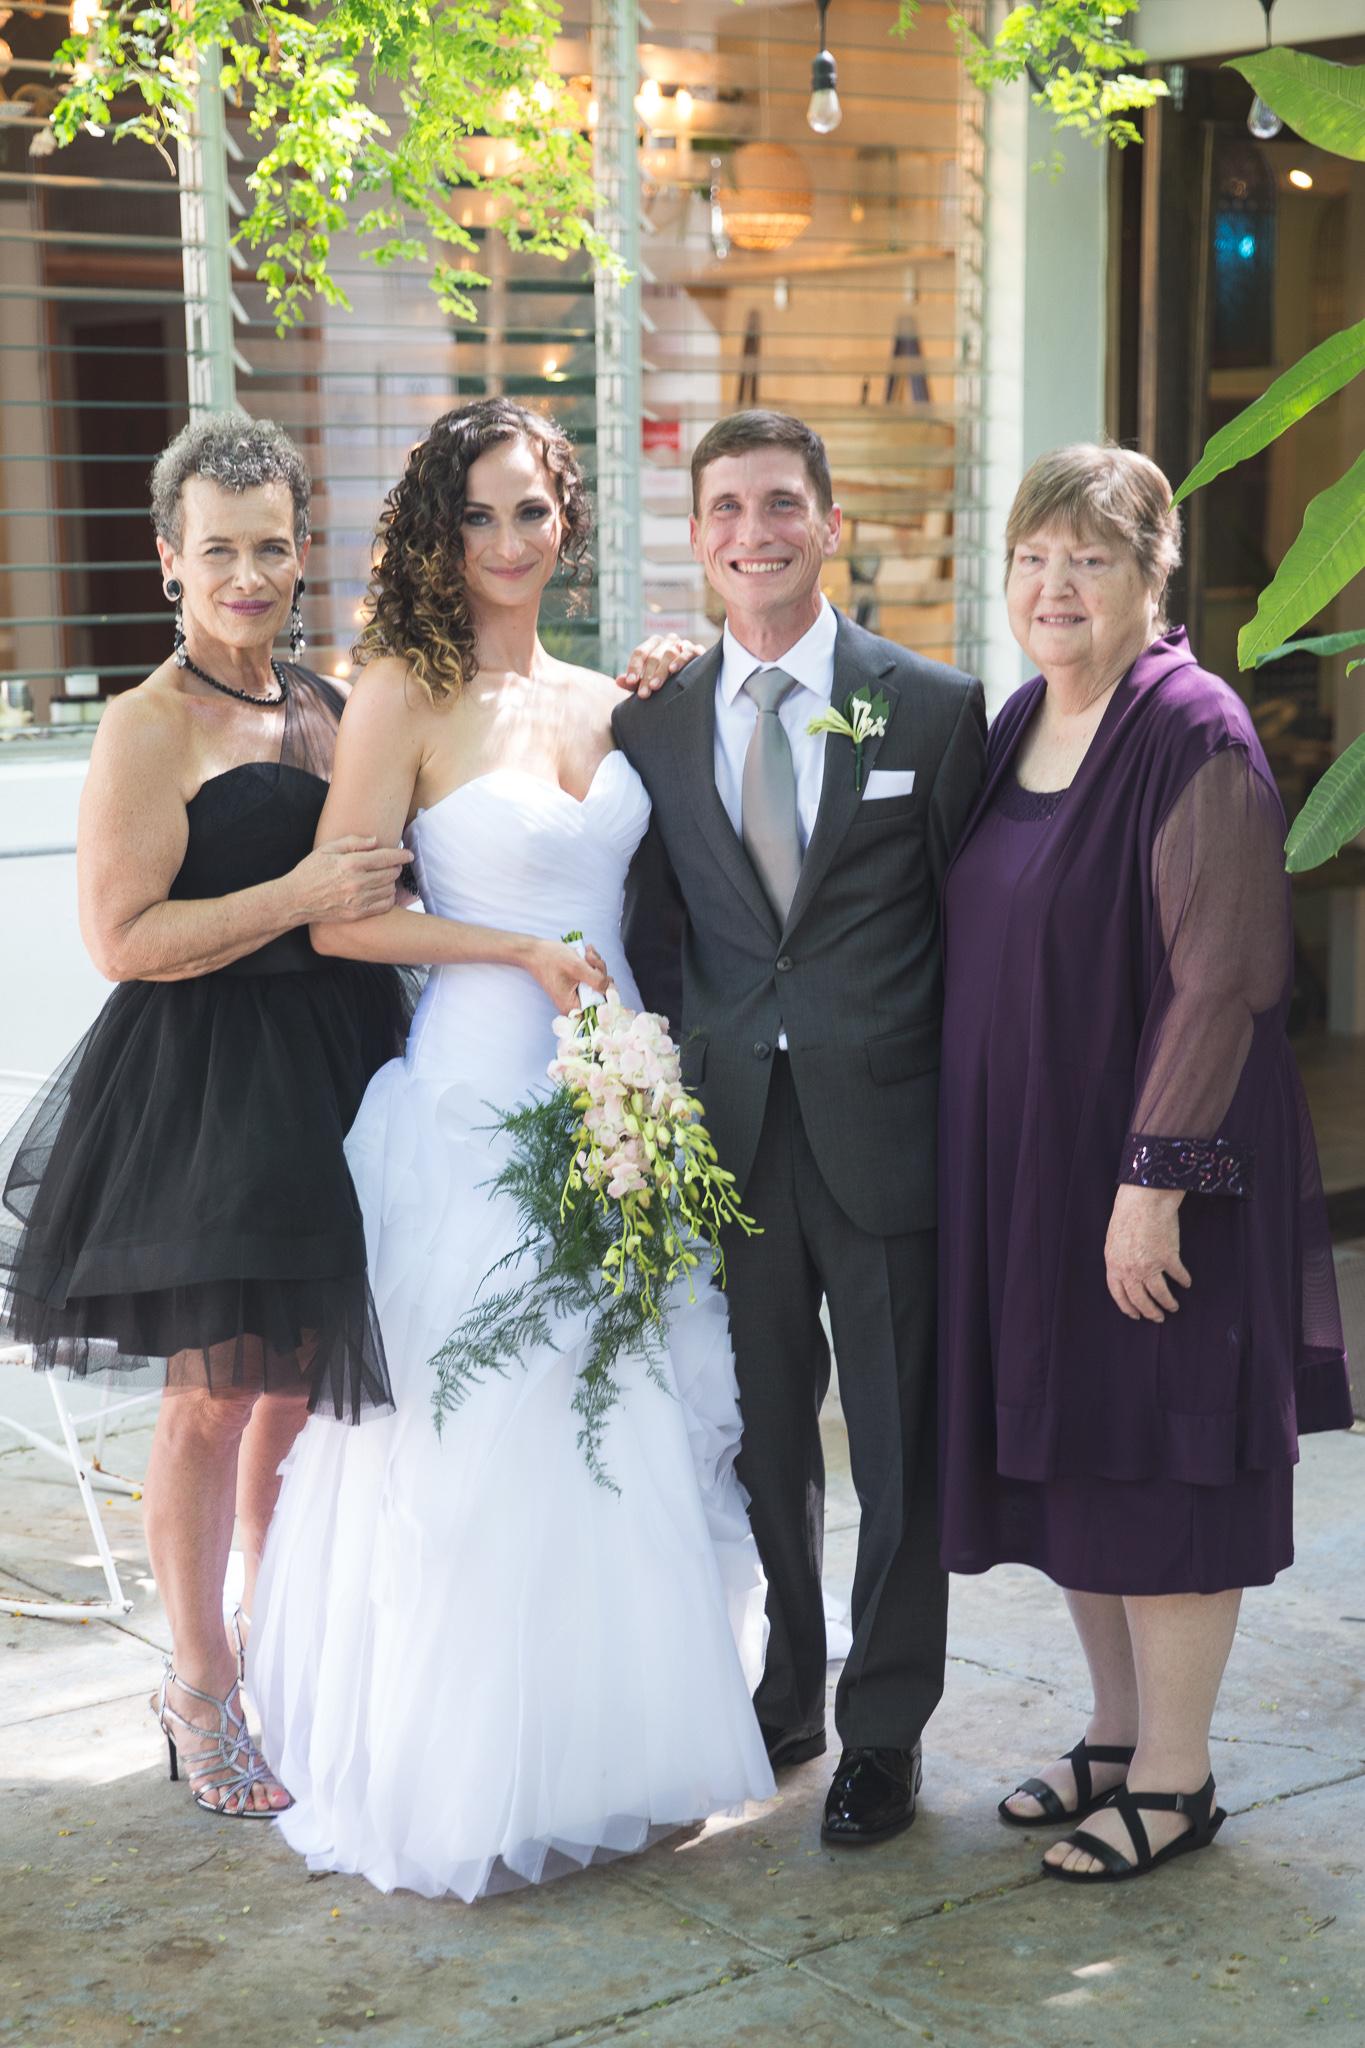 049-best-detroit-michigan-outdoor-destination-wedding-photographer.jpg